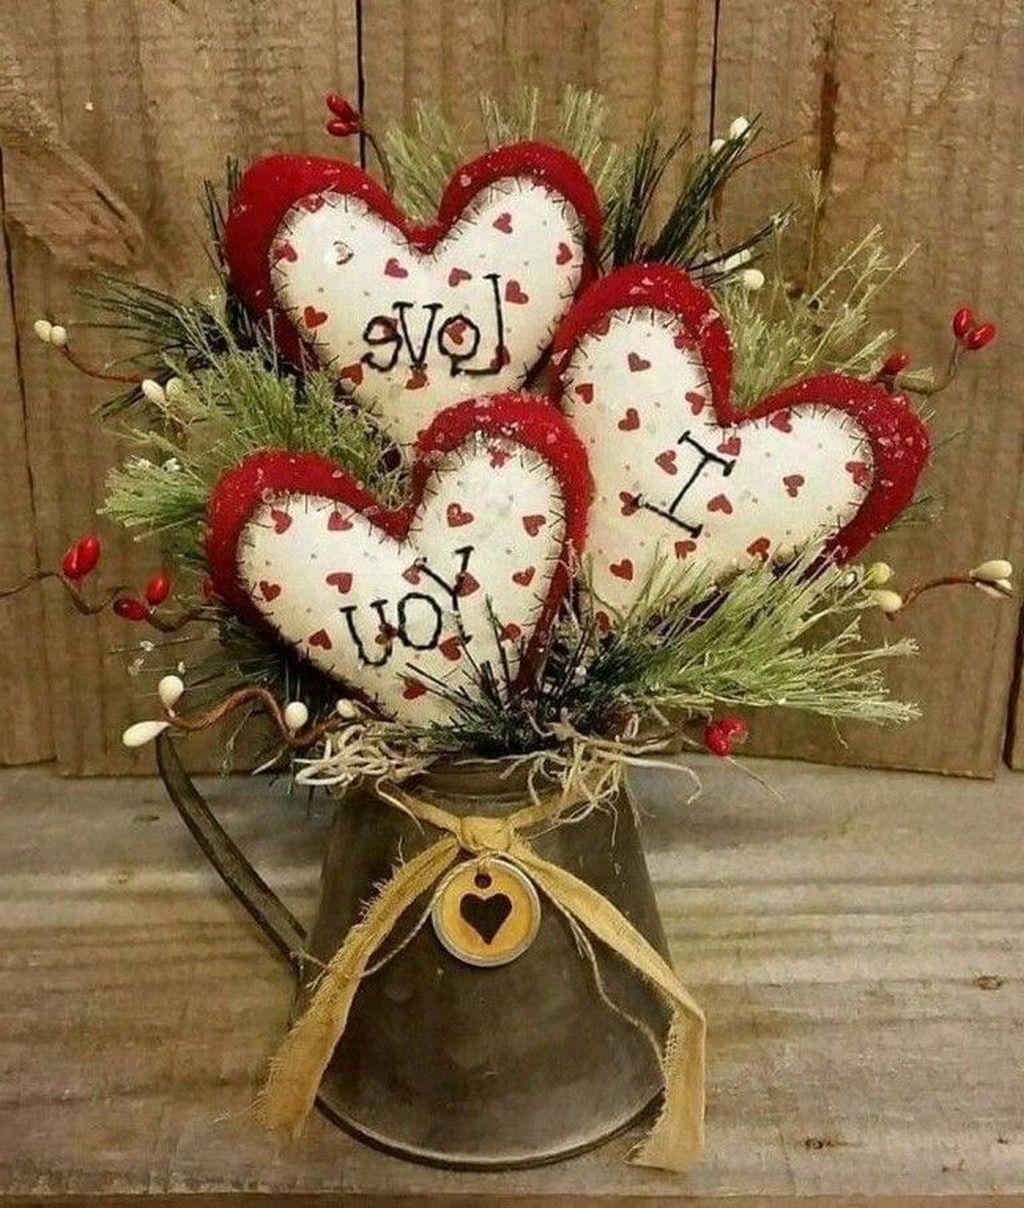 Gorgeous Valentines Day Decoration Ideas 21 Diy Valentines Decorations Diy Valentine S Day Decorations Valentine Decorations